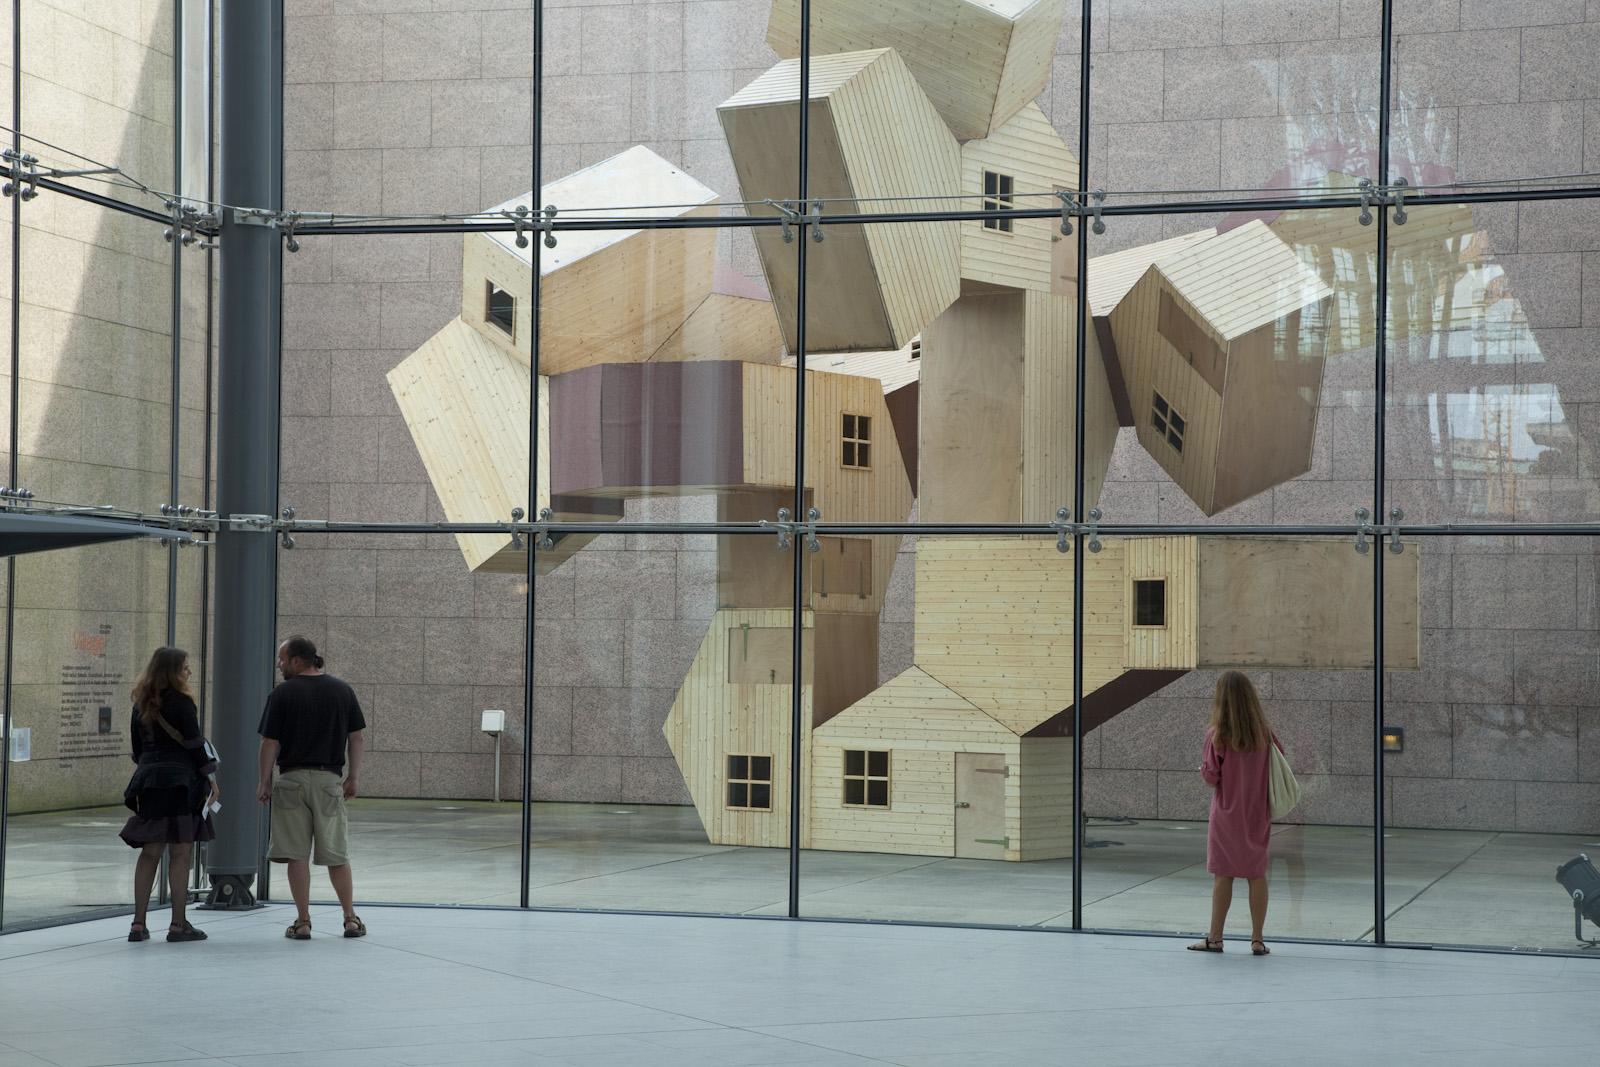 culture exposition mus e matthieu colin photographe. Black Bedroom Furniture Sets. Home Design Ideas